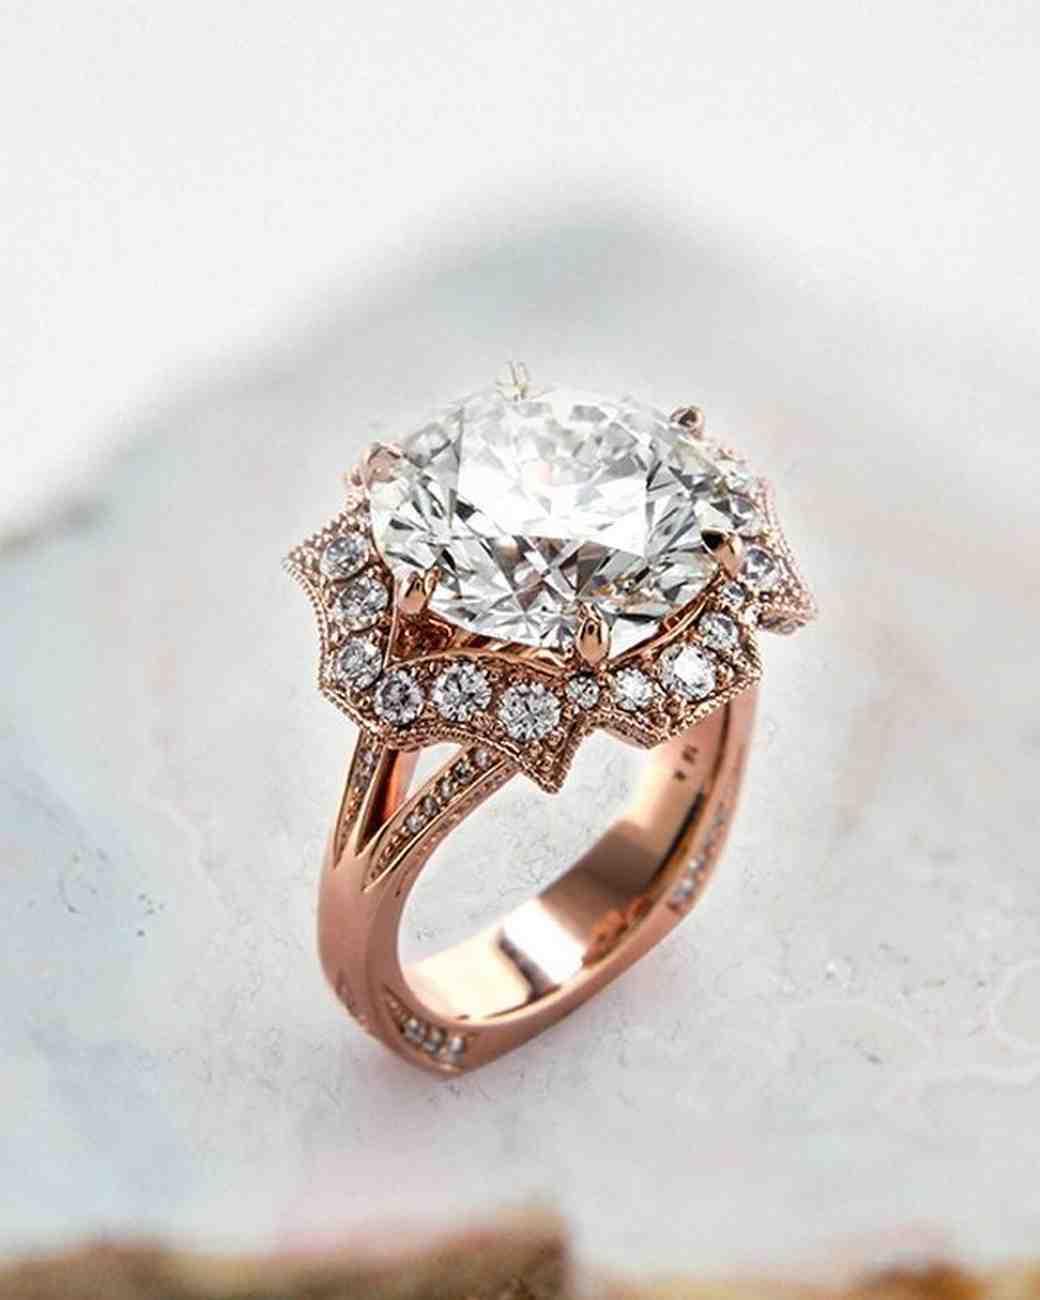 27 Unique Engagement Rings You'll Love | Martha Stewart ...